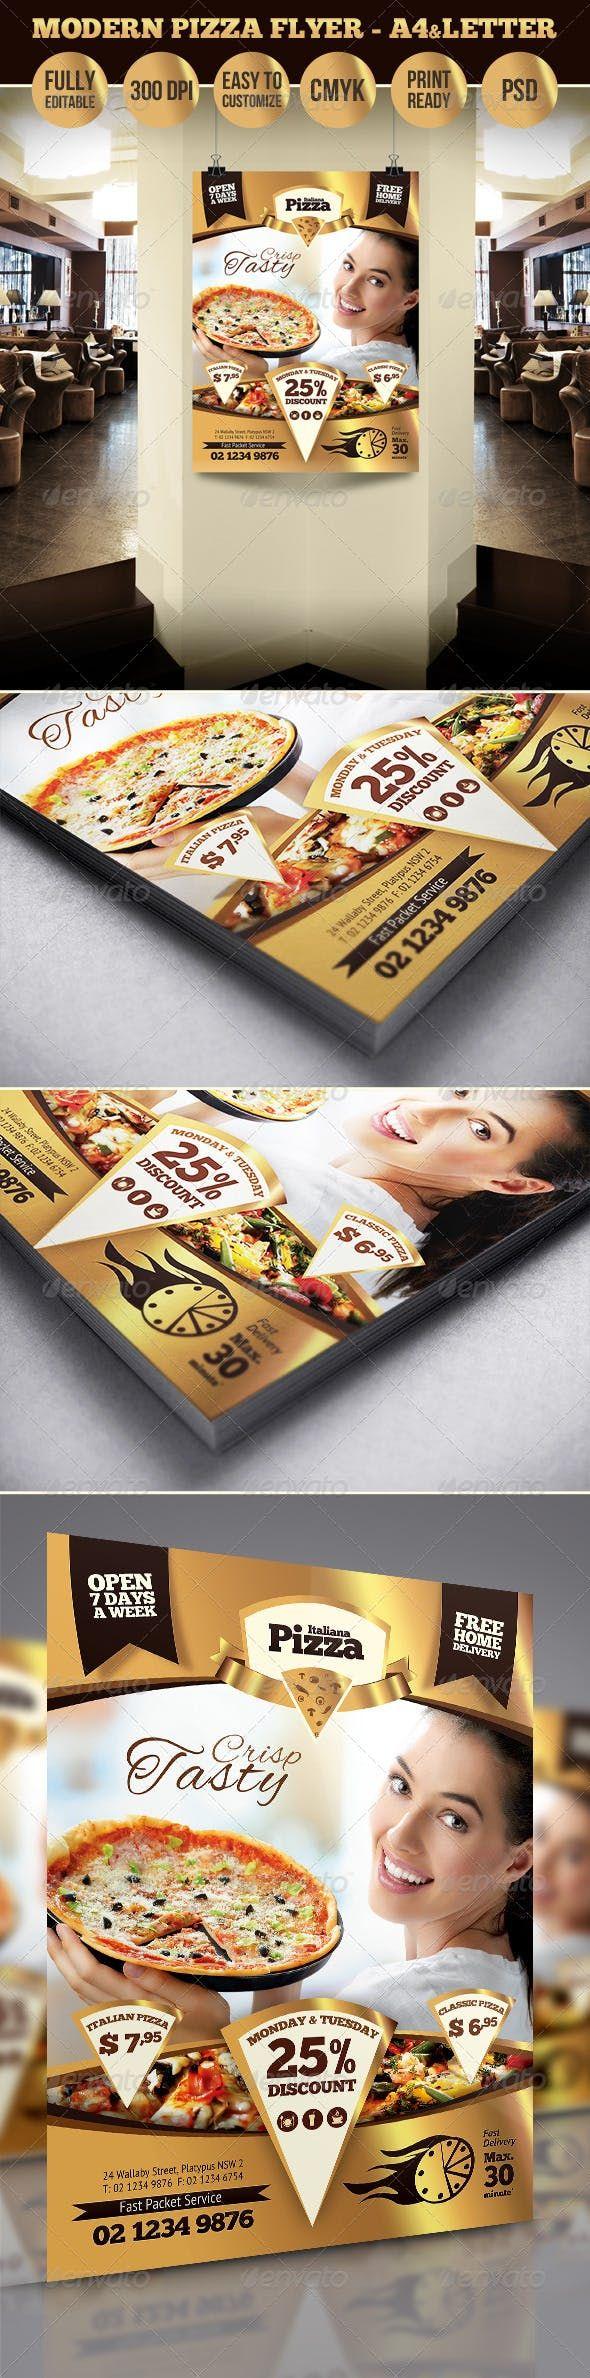 Modern Pizza Flyer A4 & Letter Sizes — PSD